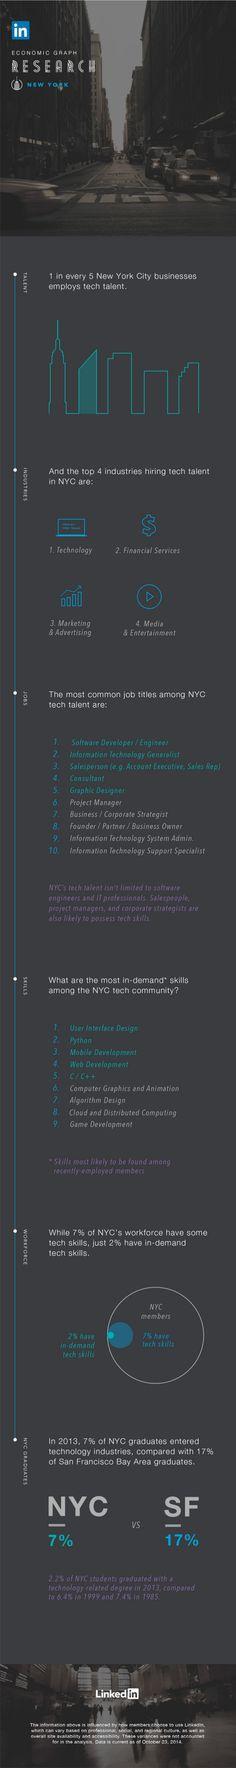 LinkedIn Economic Graph Research New York